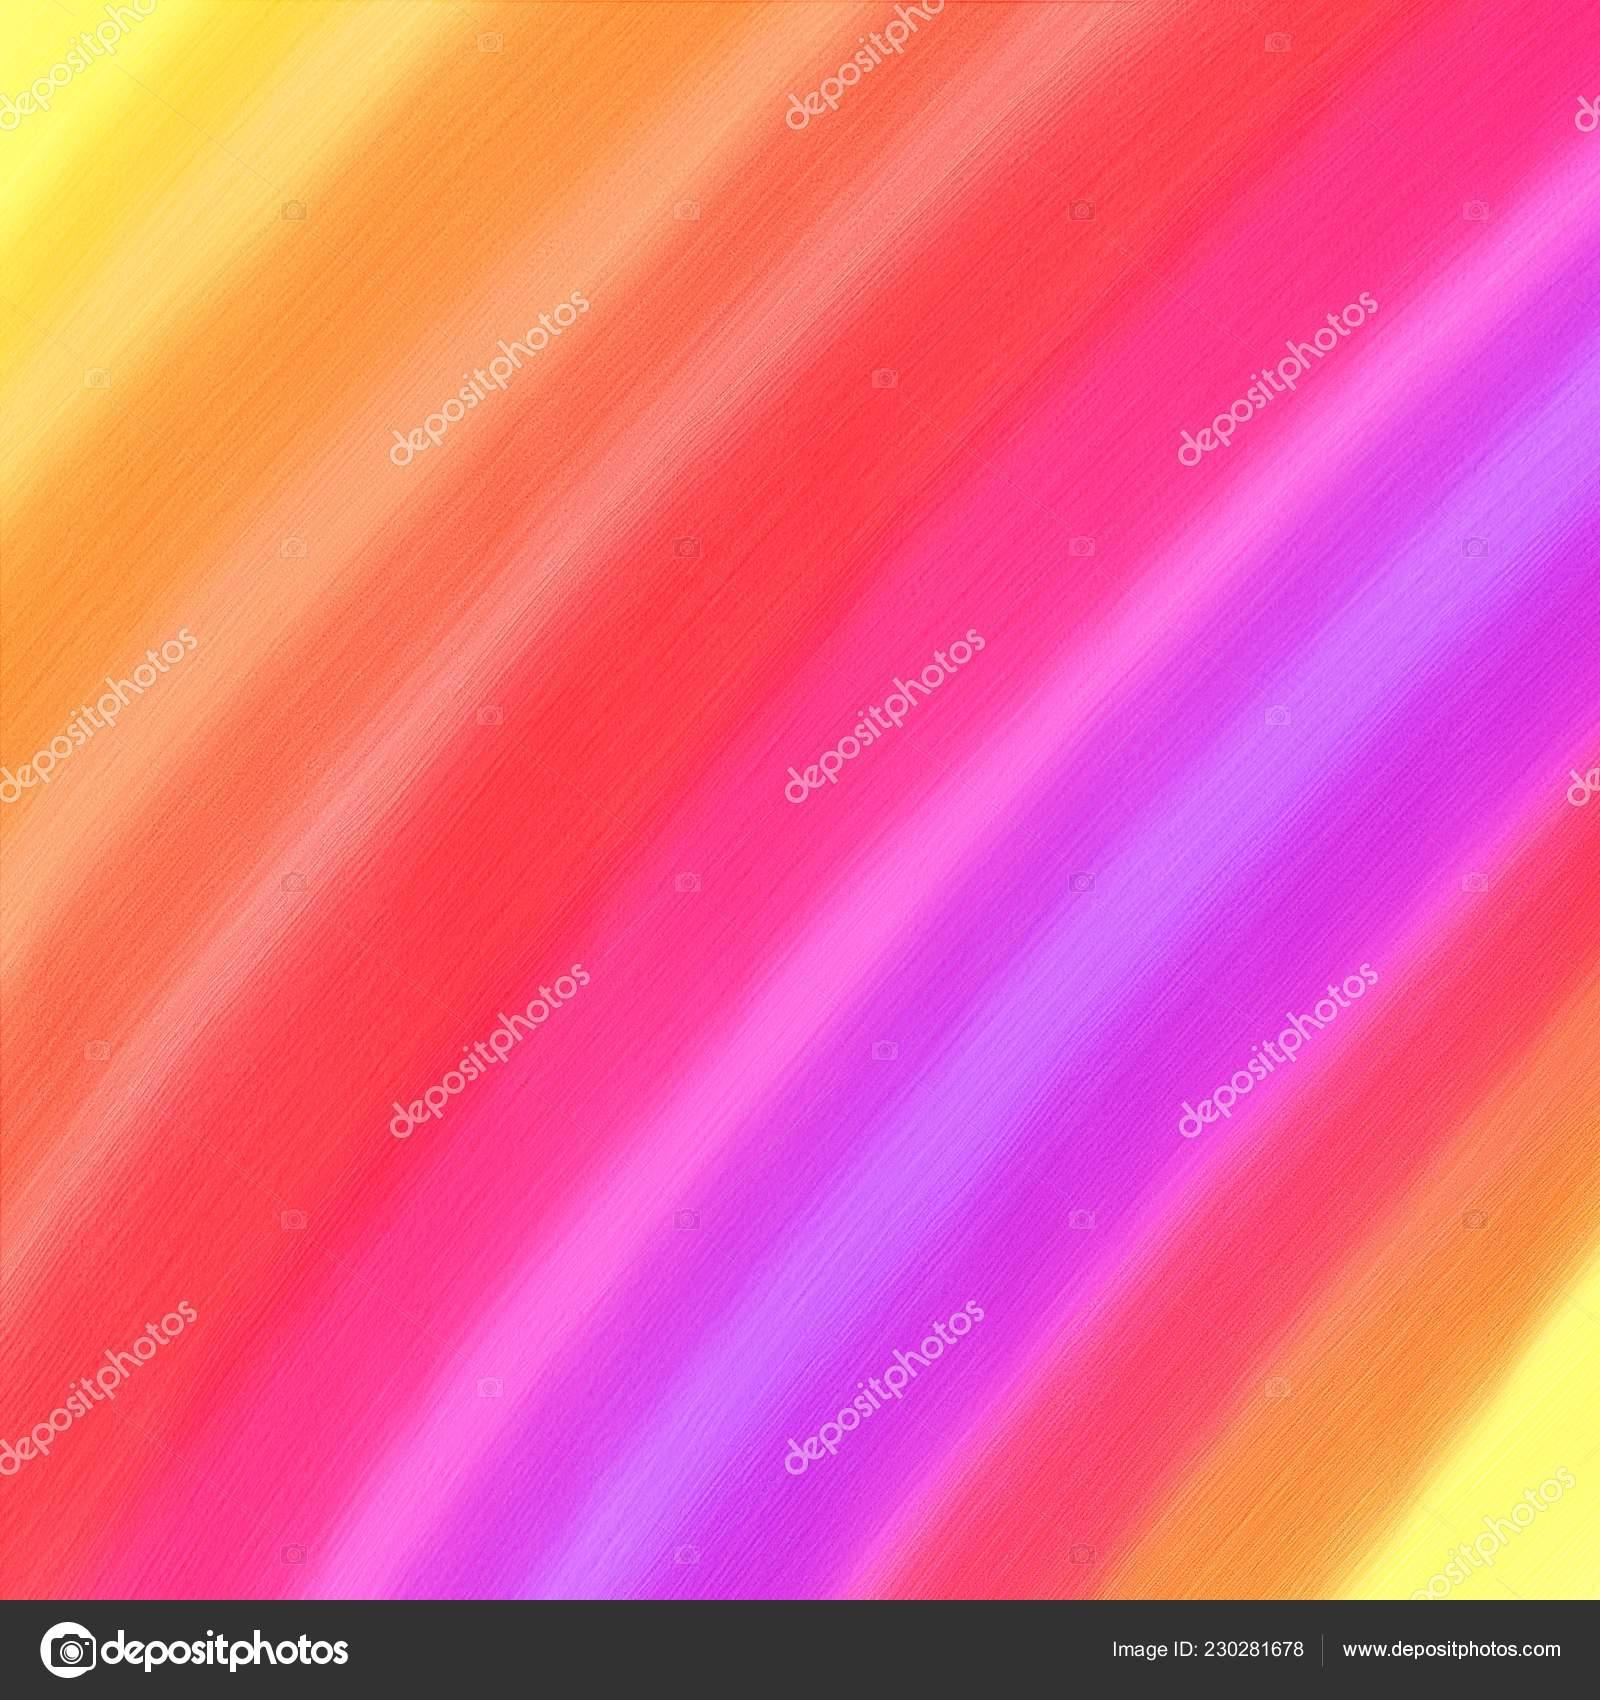 063305c1a629 Fondo Acuarela Digital Colorido Brillante Con Rayas Naranja Rosado Púrpura  — Fotos de Stock